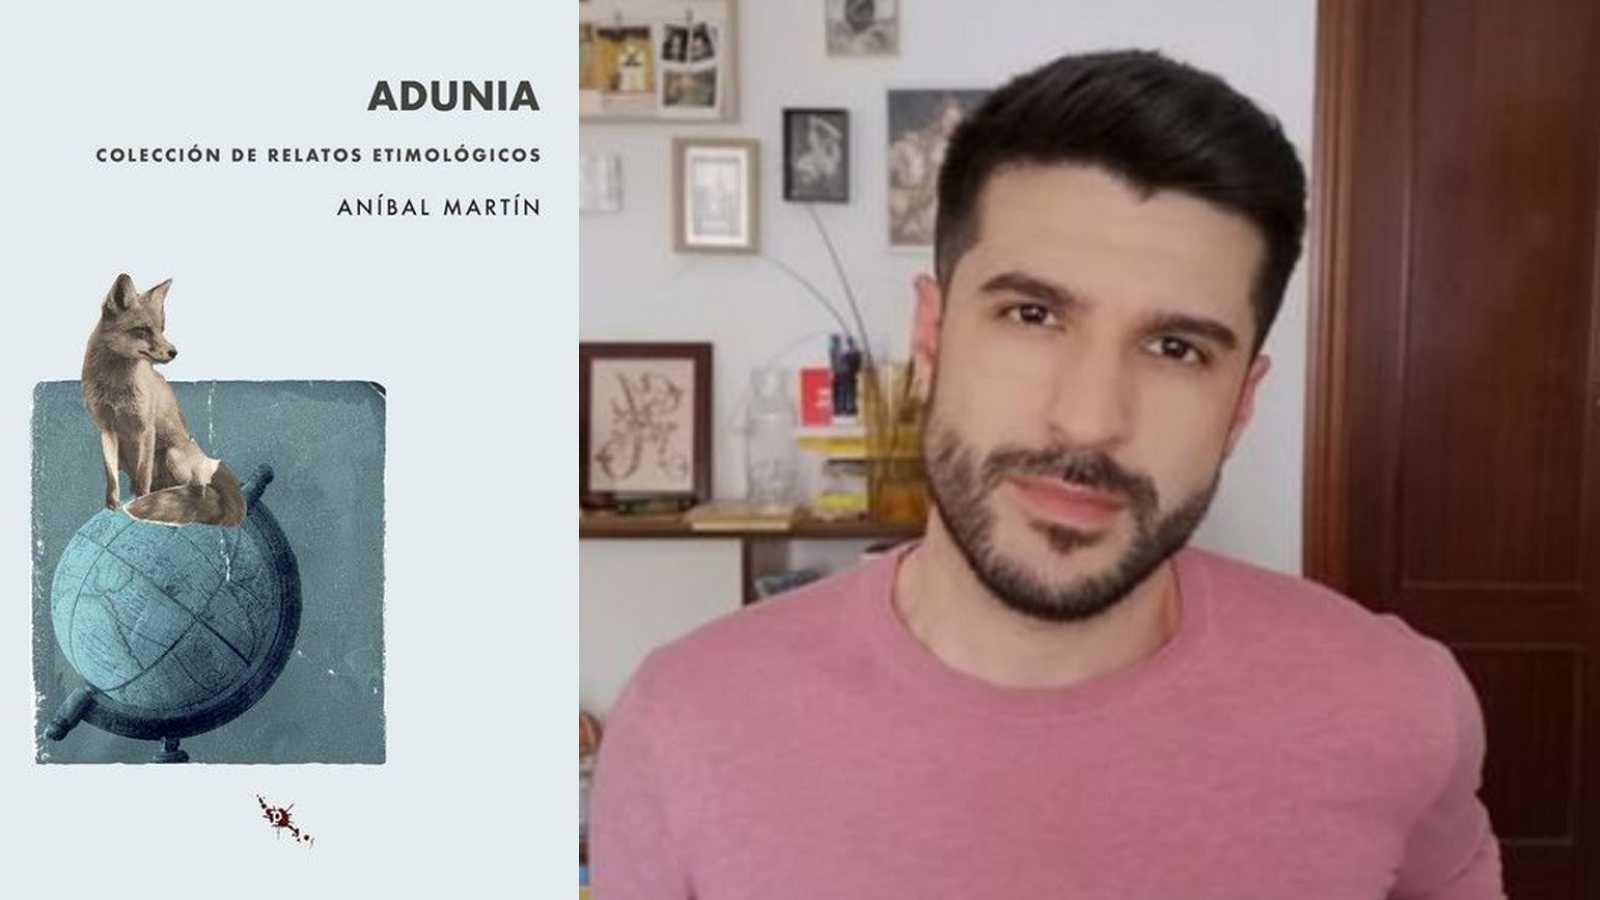 Un idioma sin fronteras - 'Adunia. Colección de relatos etimológicos', de Aníbal Martín - 24/04/21 - escuchar ahora